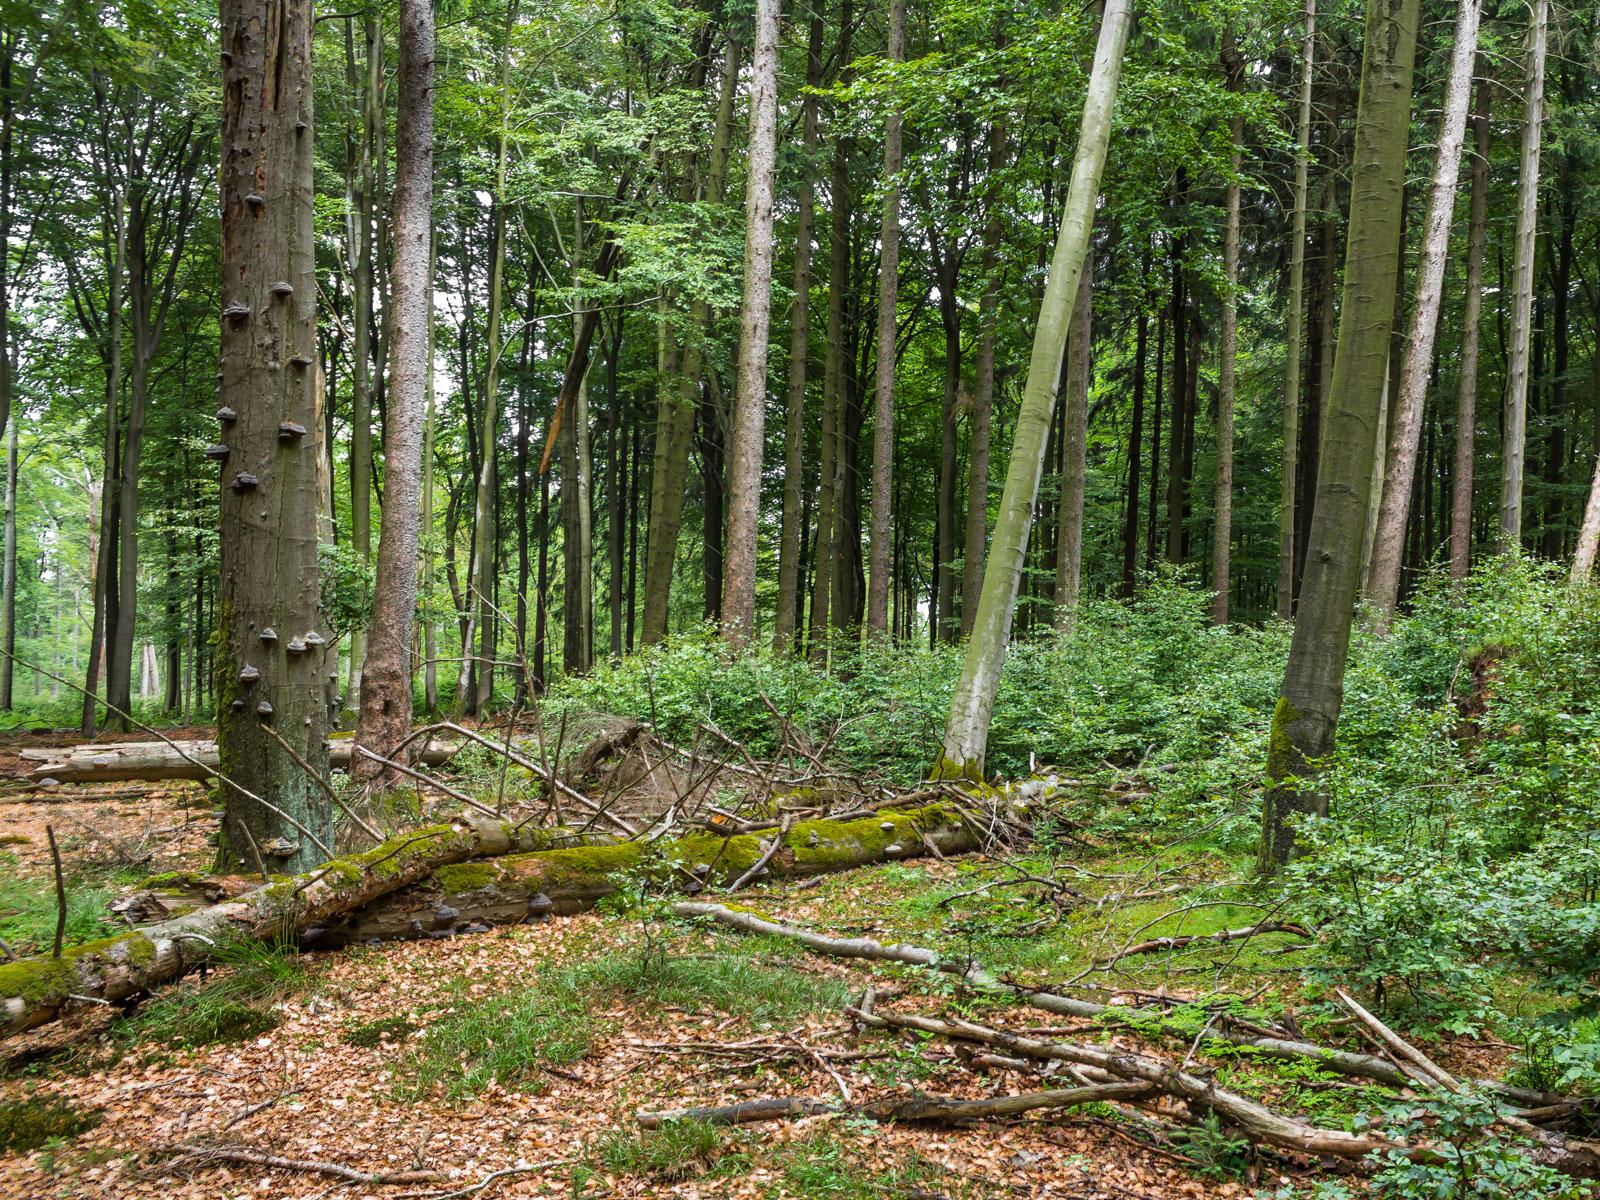 Totholz und Naturverjüngung